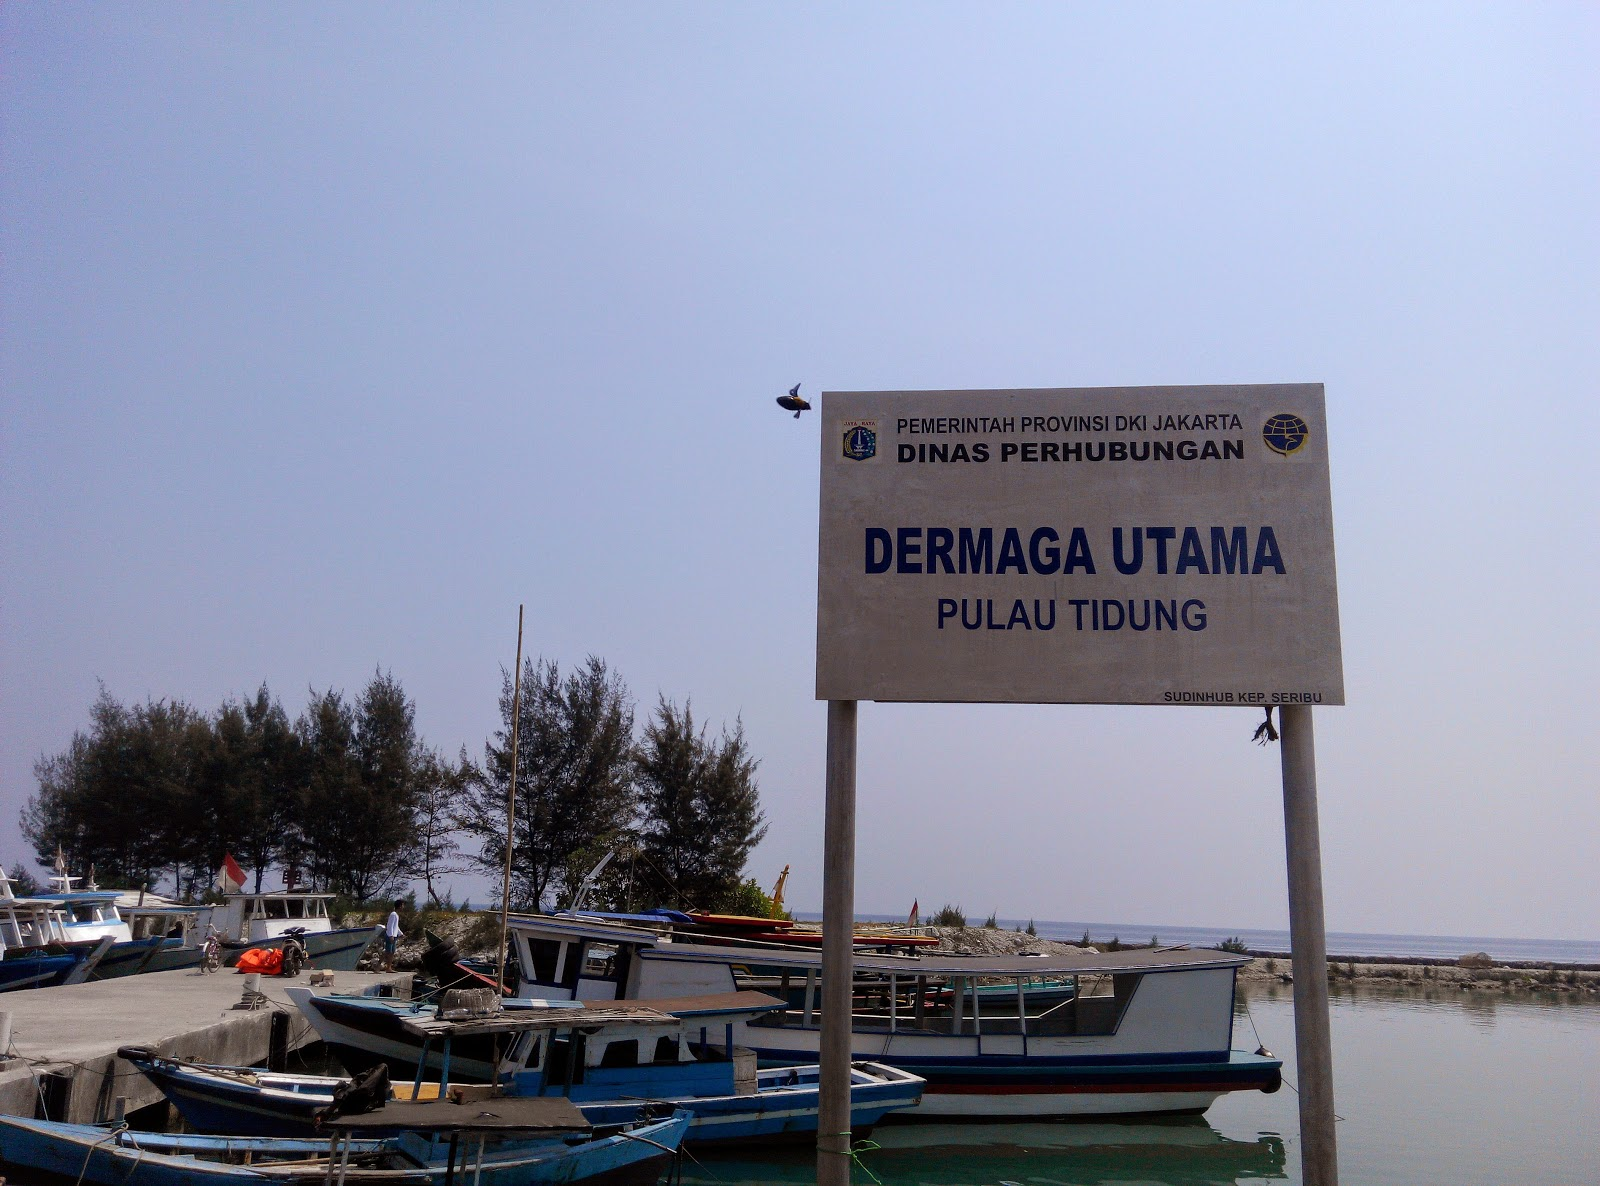 Dermaga Utama Pulau Tidung